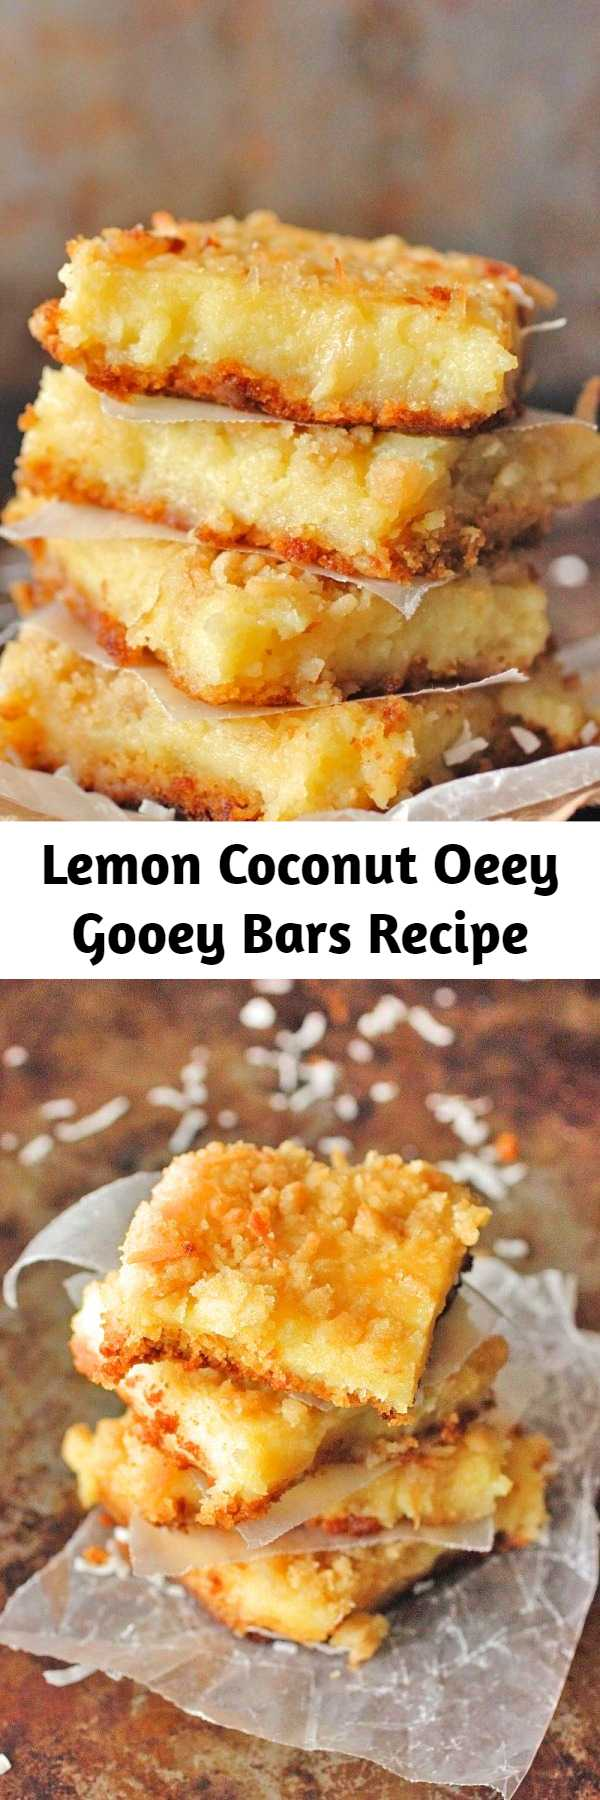 Lemon Coconut Oeey Gooey Bars Recipe